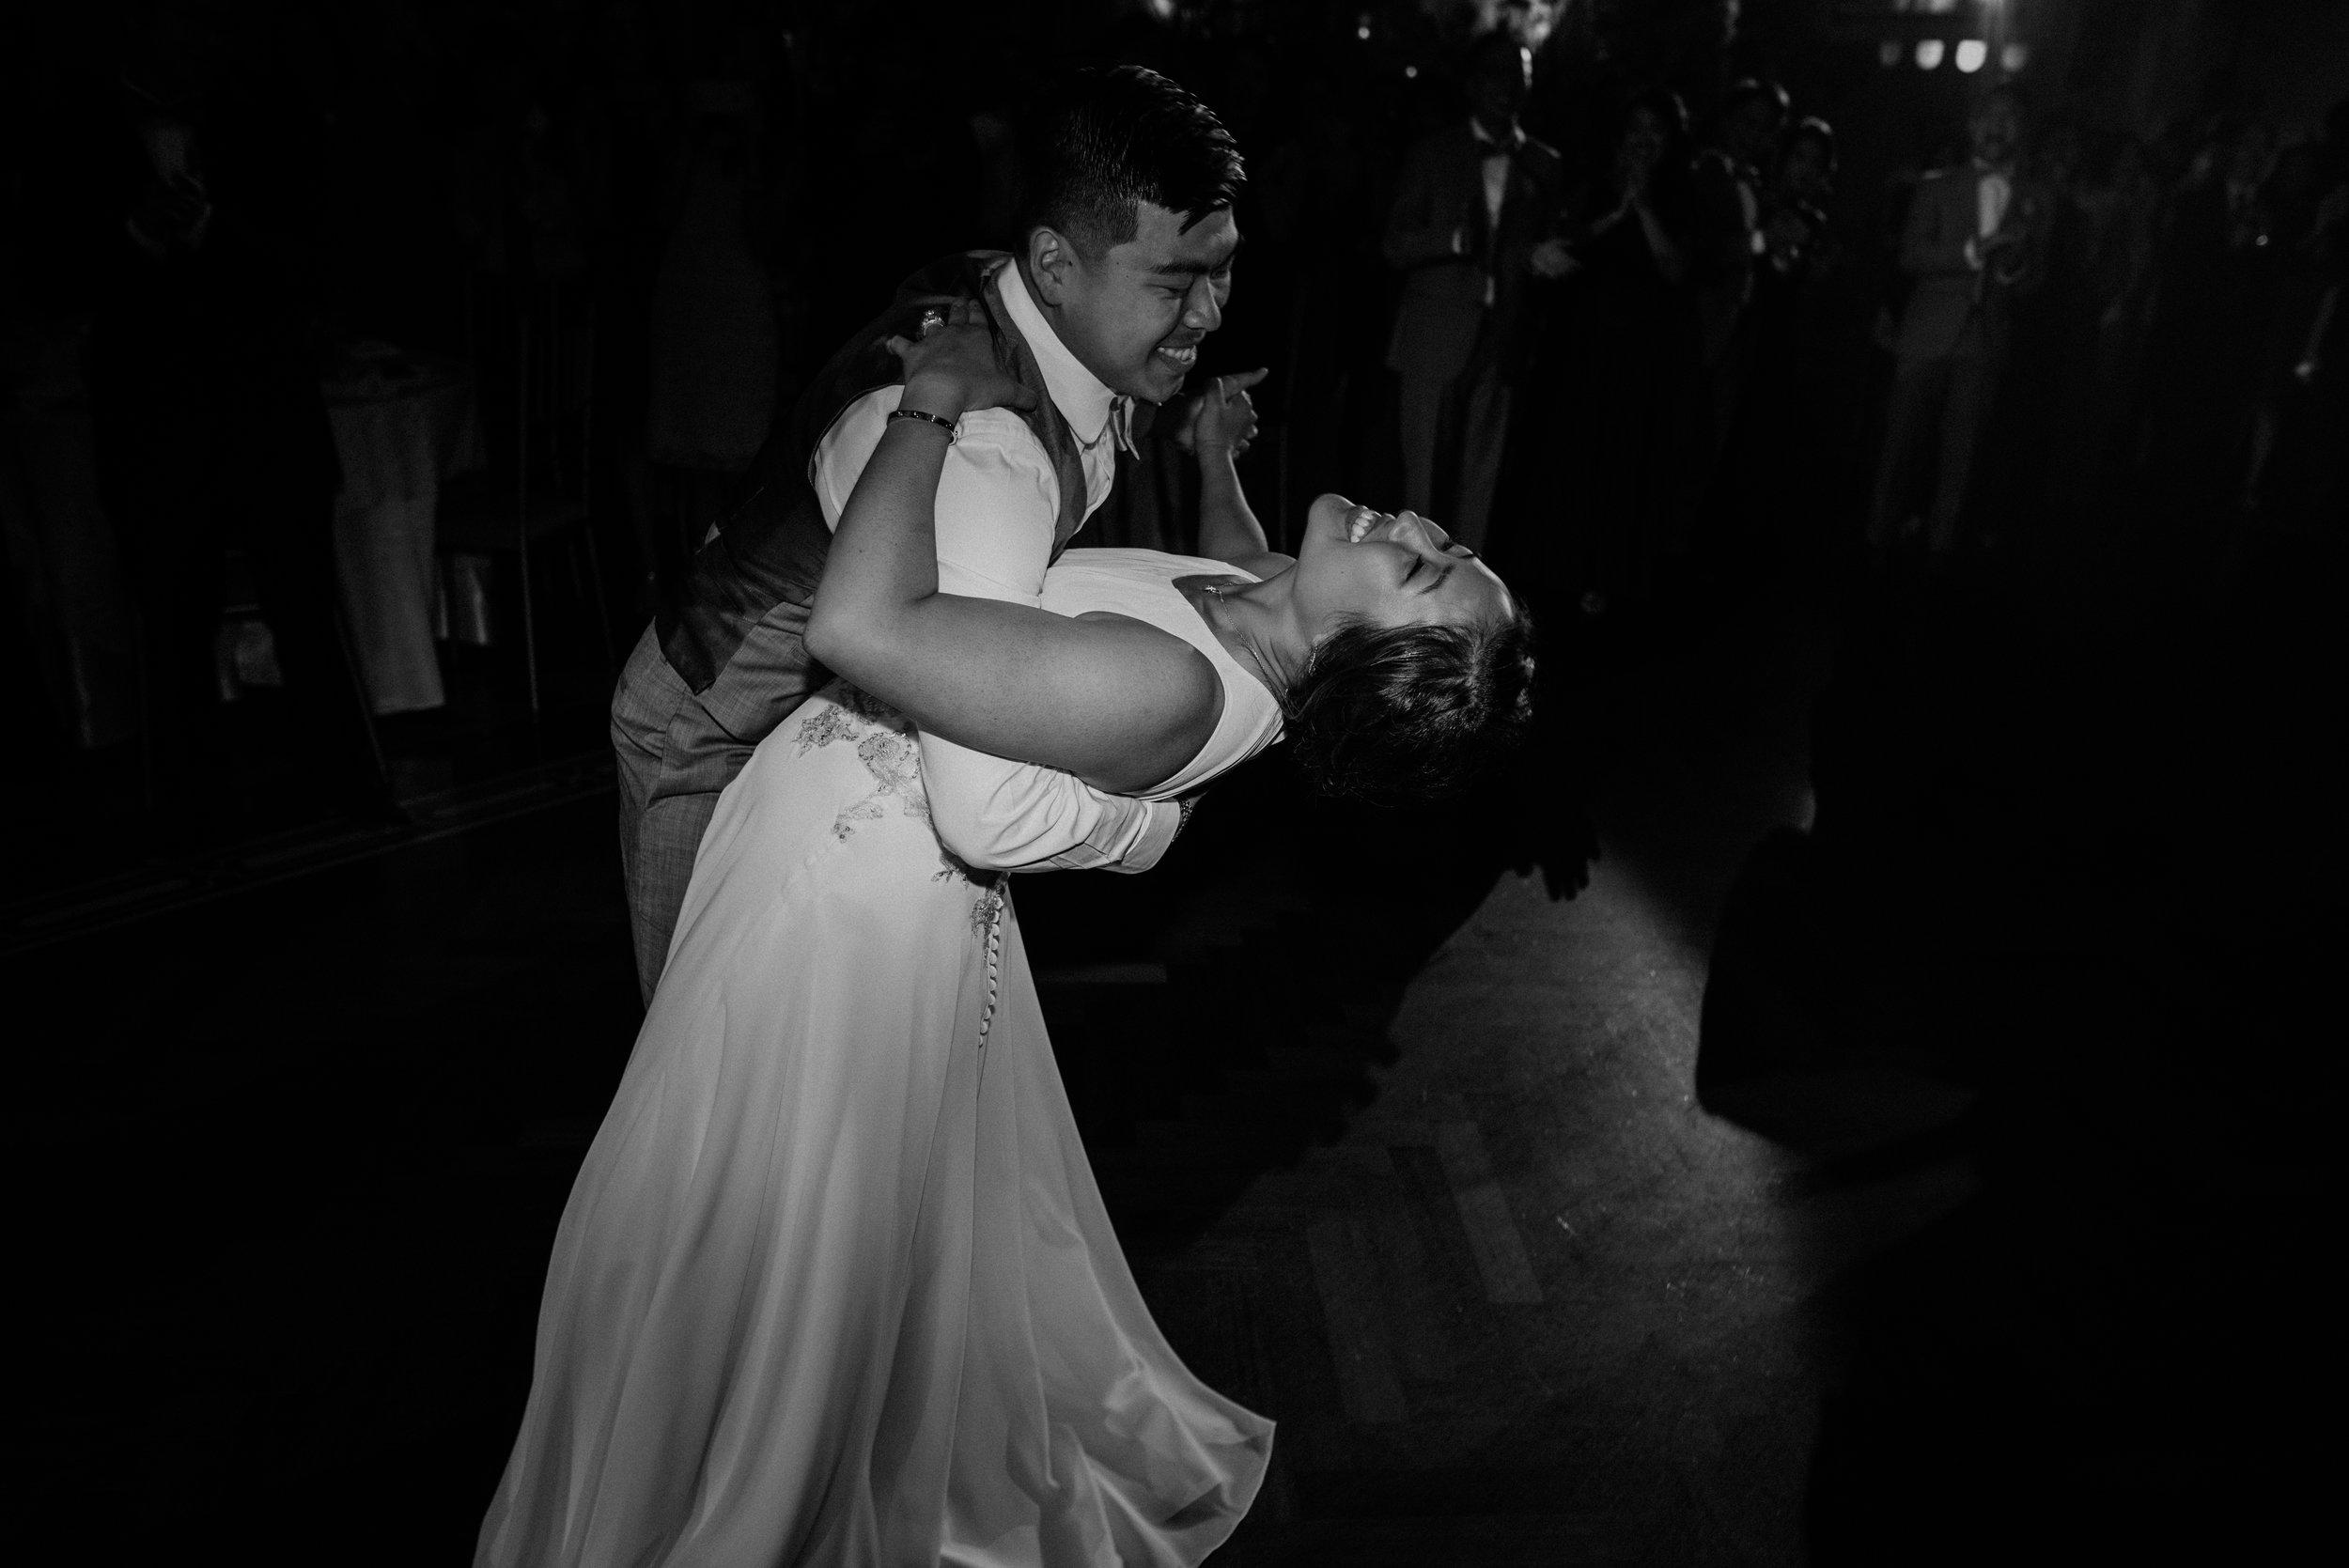 Main and Simple Photography_2017_Weddings_NewYork_TinaJon-1320.jpg